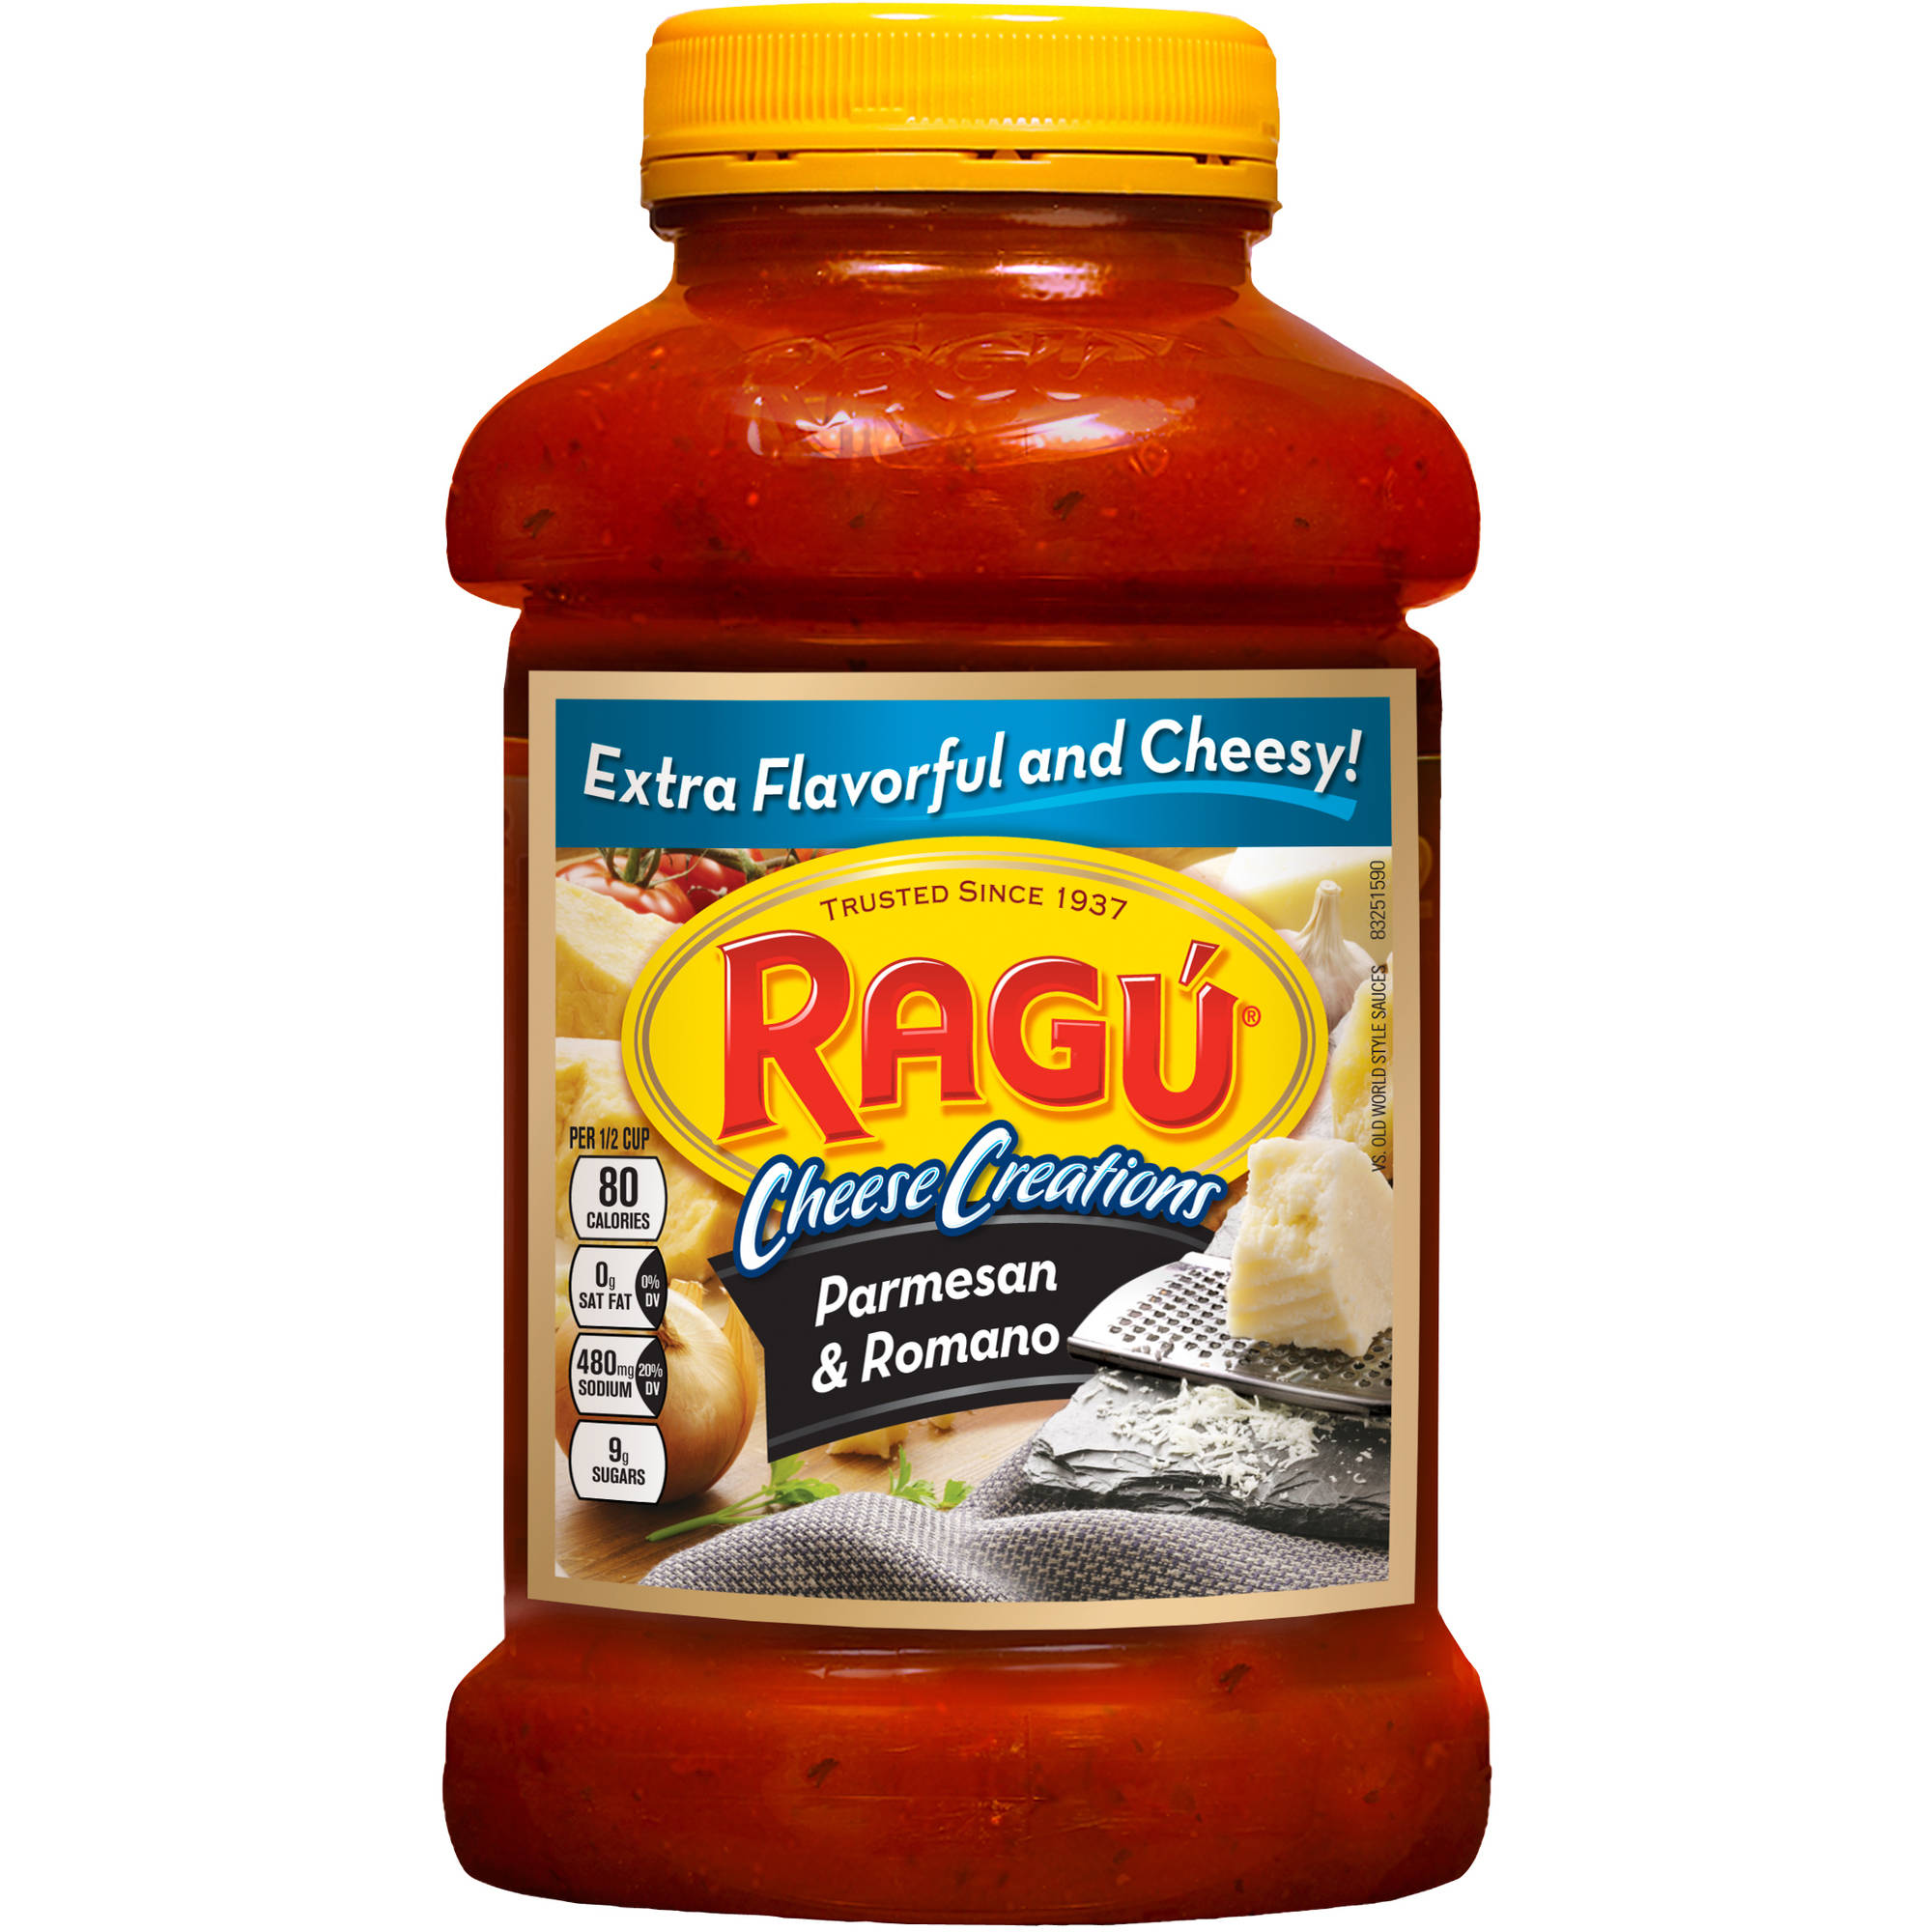 Ragu Robusto Parmesan And Romano Pasta Sauce, 45 oz